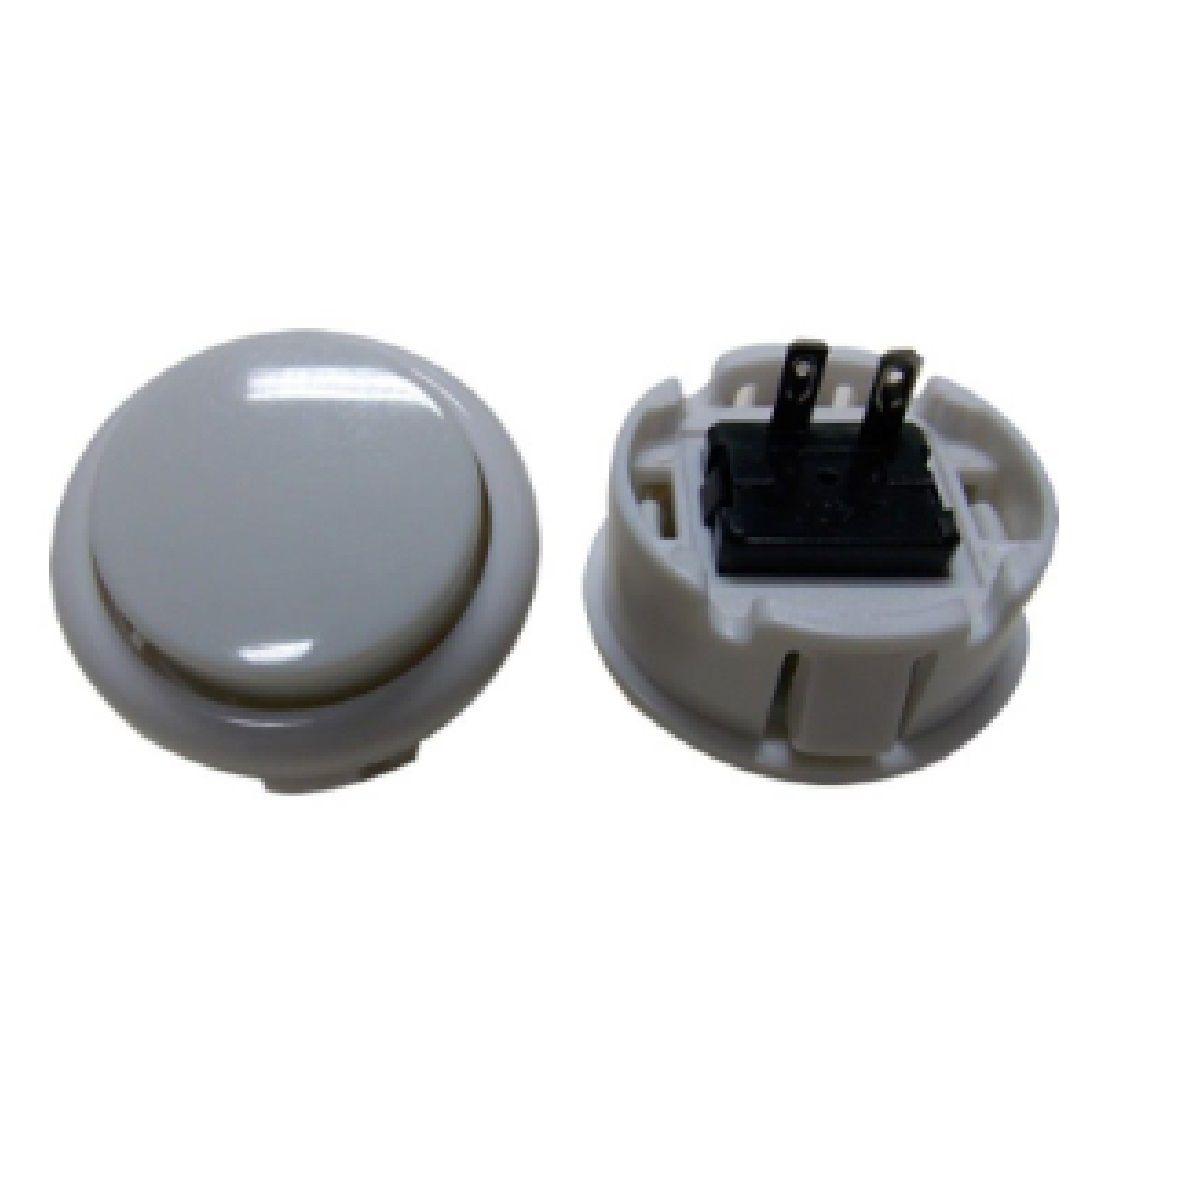 Botão Arcade Fliperama Alta Performance Tipo Sanwa (conector 2.8mm) Branco